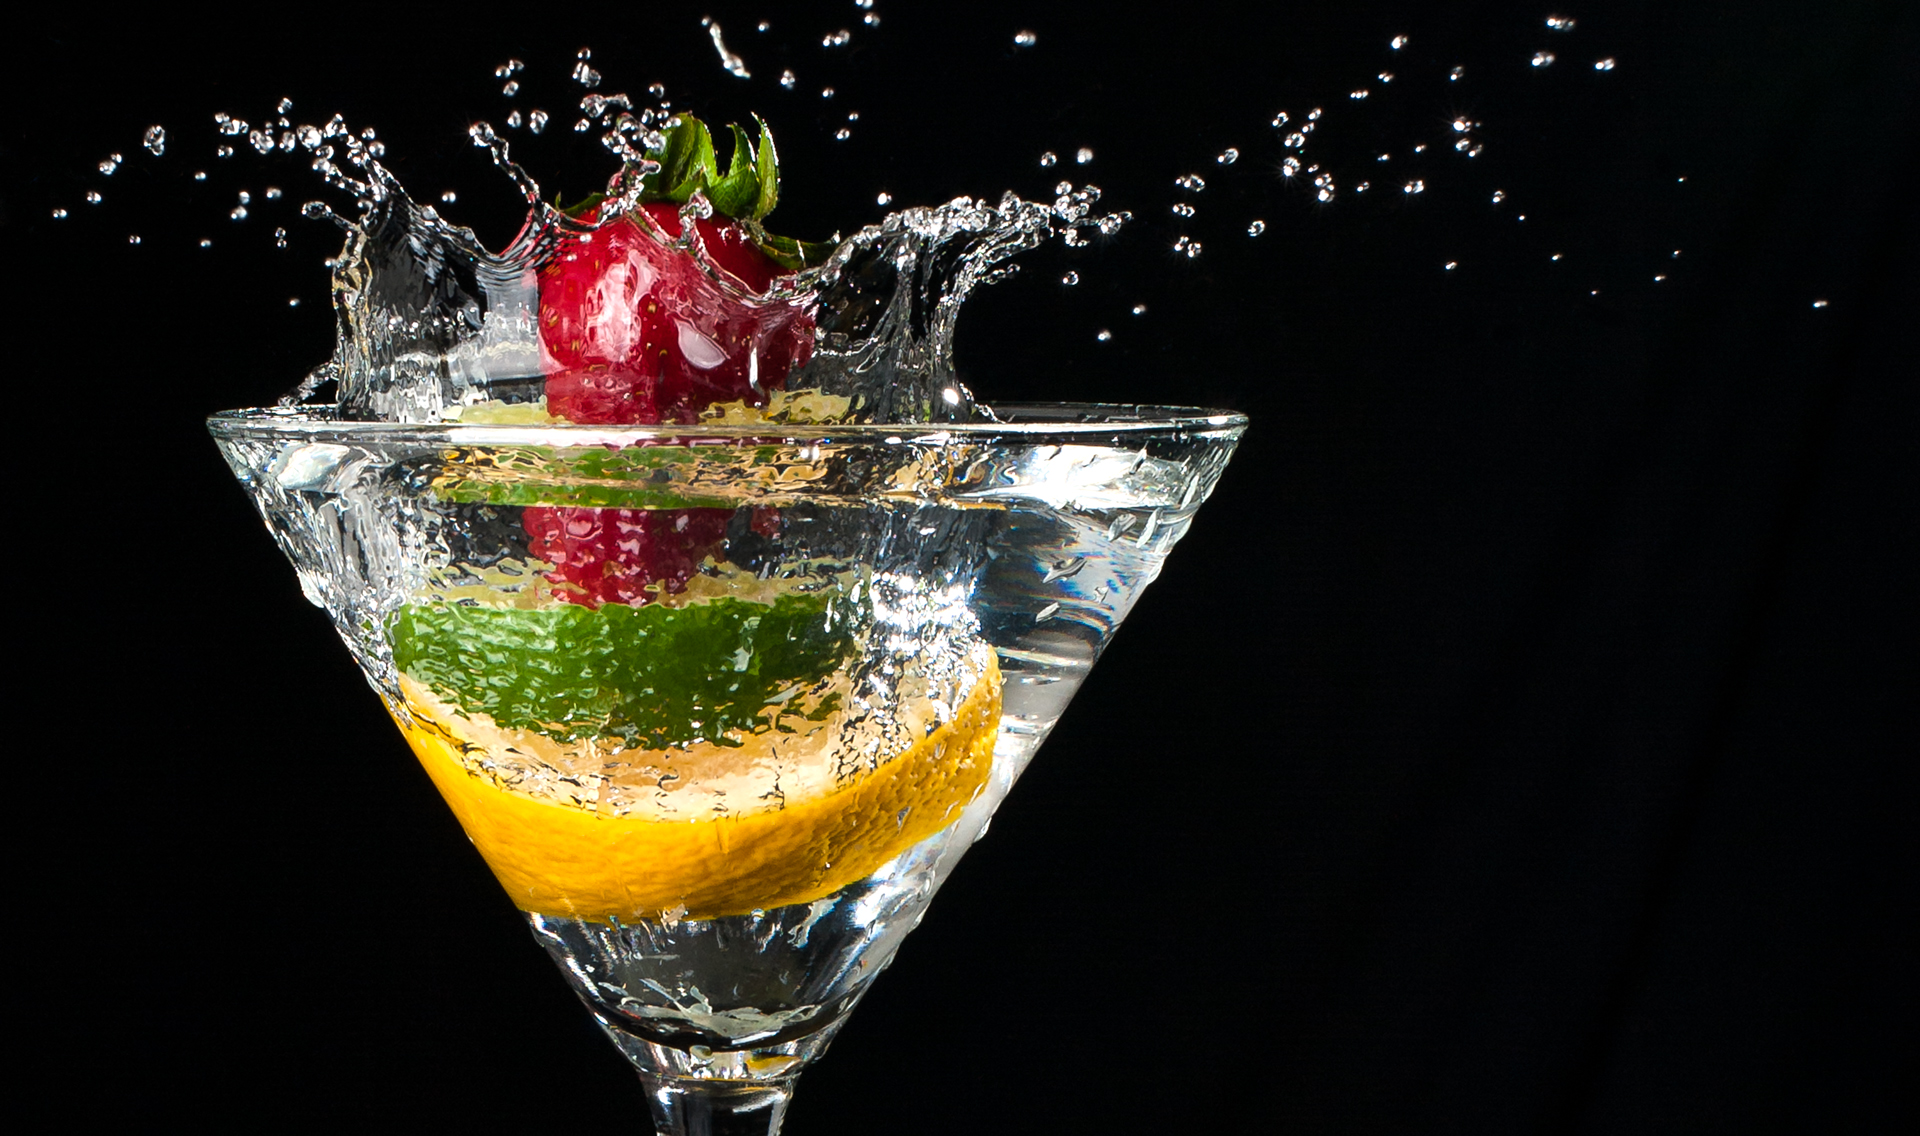 Glass Wallpaper Hd Fruit Splash Damian Vines Photography